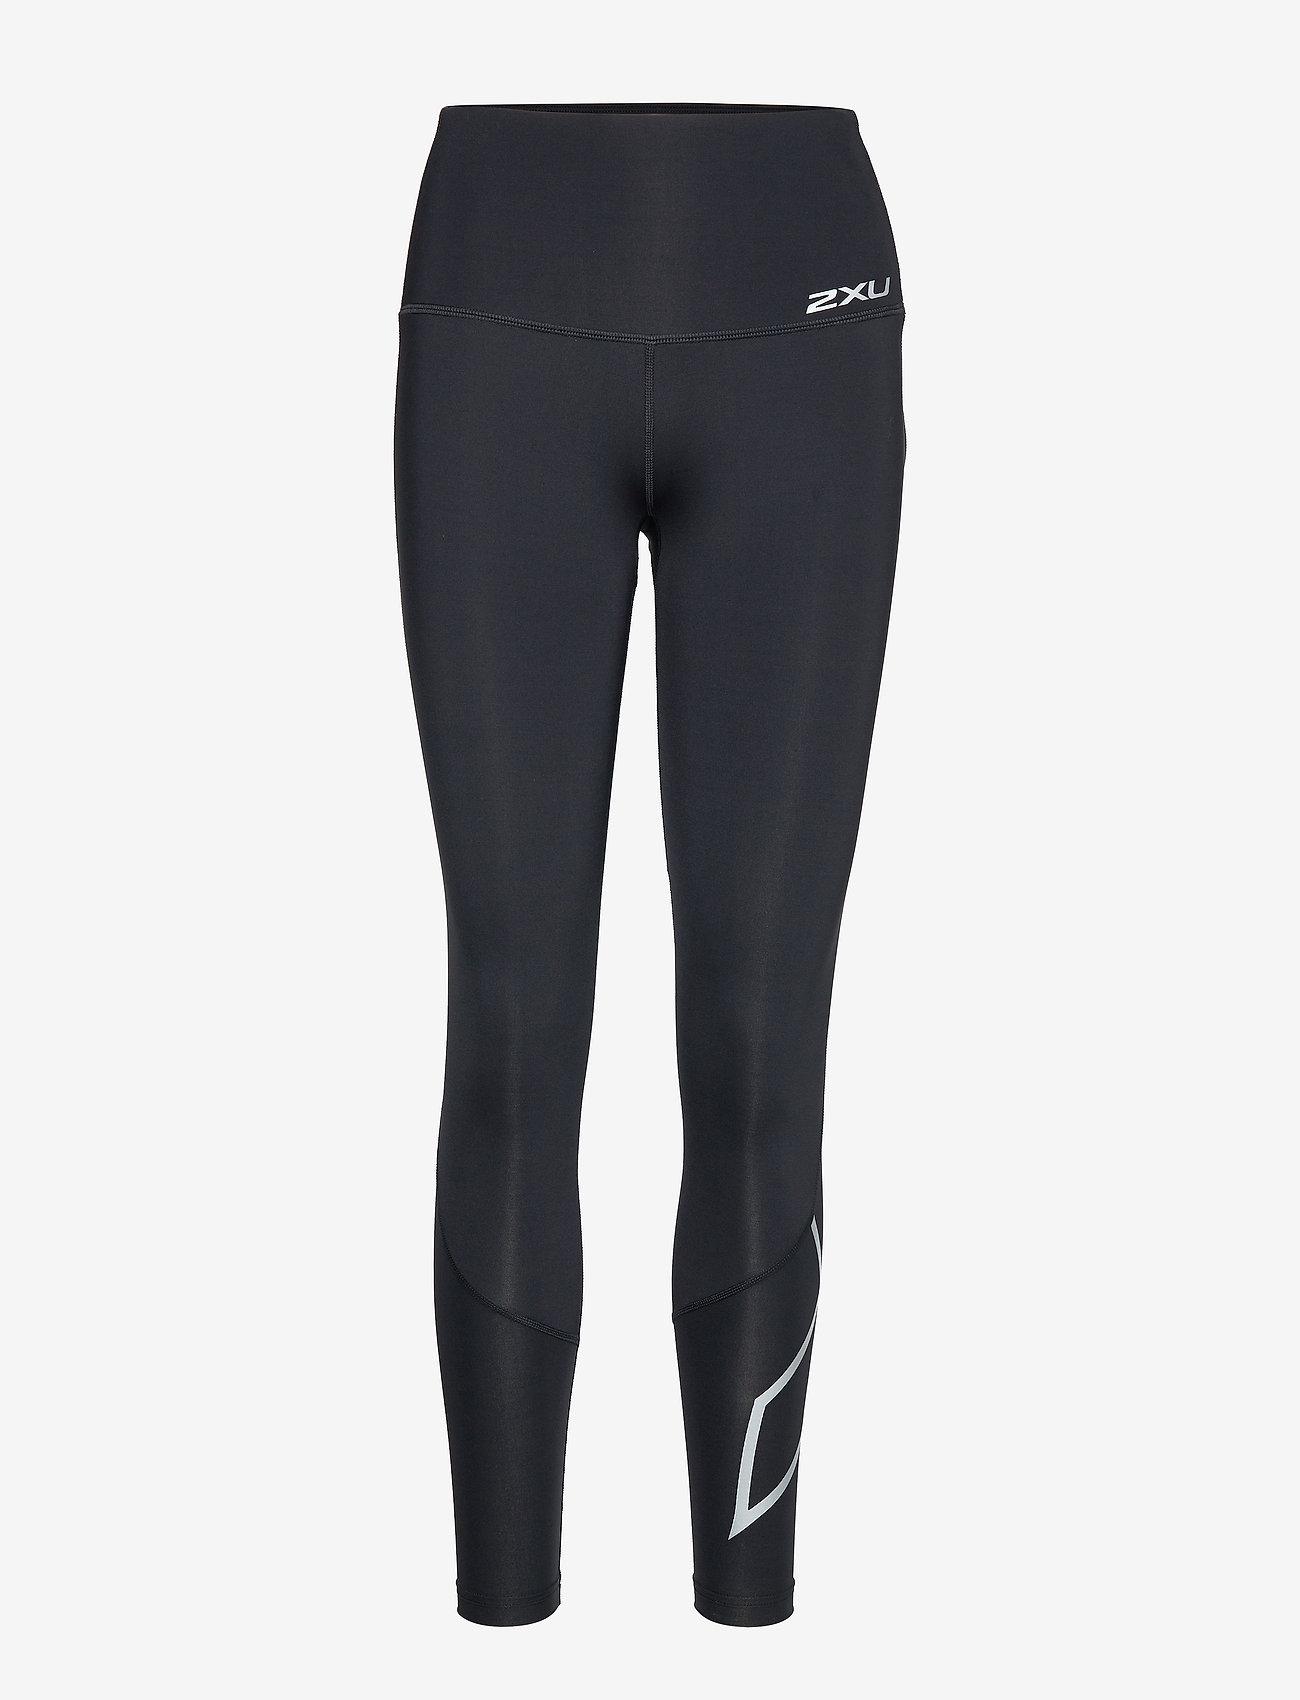 2XU - MOTION HI-RISE COMPRESSION TI - sportleggings - black/silver x logo - 0